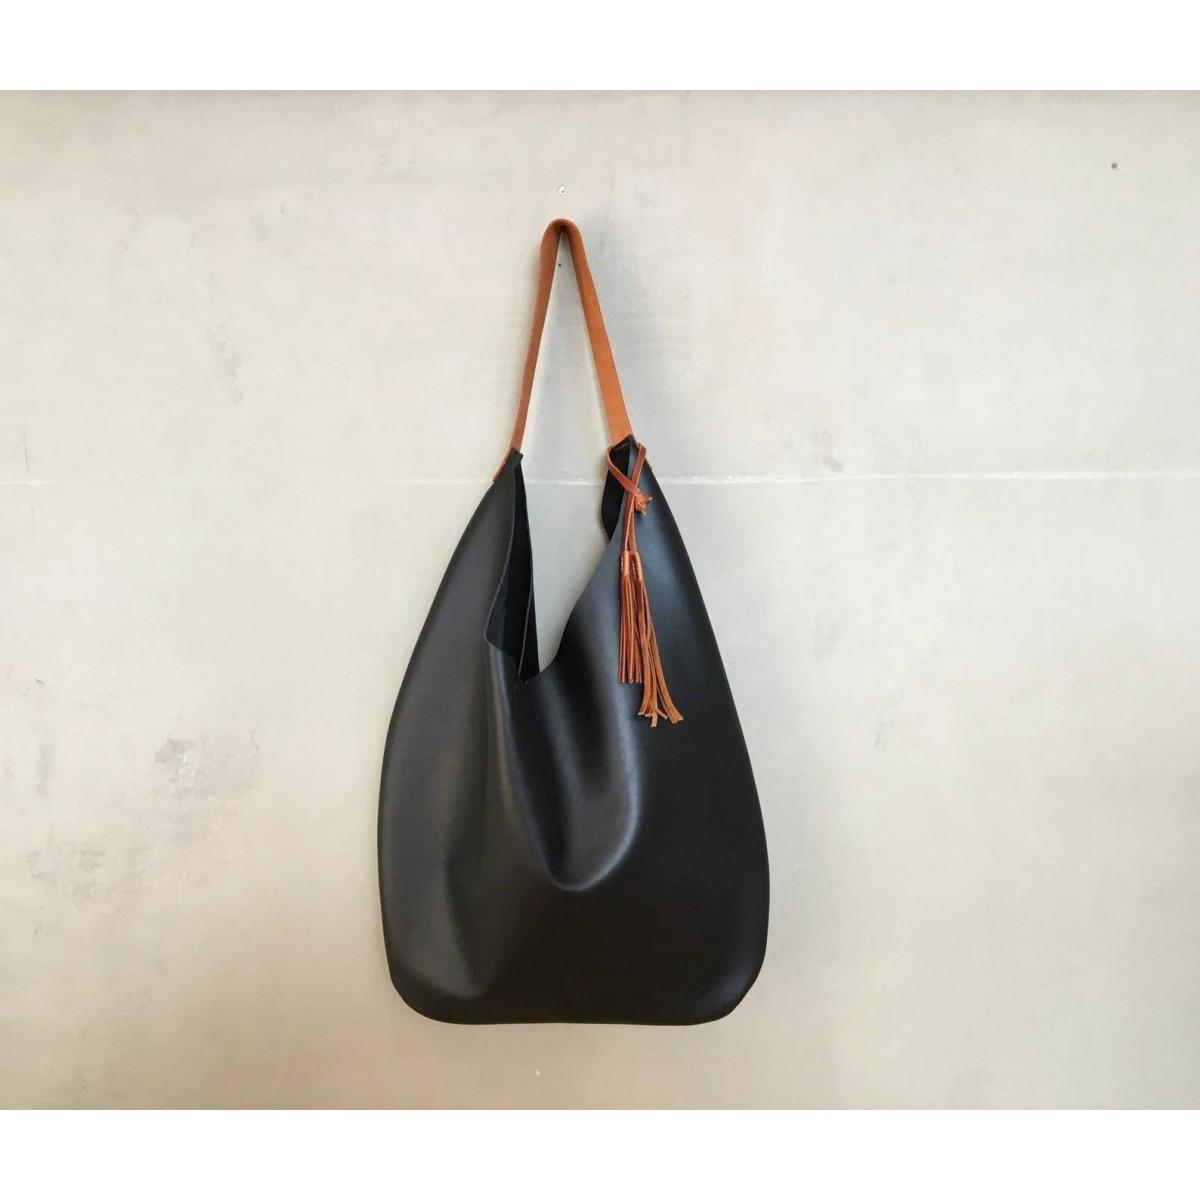 BSAITE große Beuteltasche aus echtem Leder / Hobo Bag / schwarz